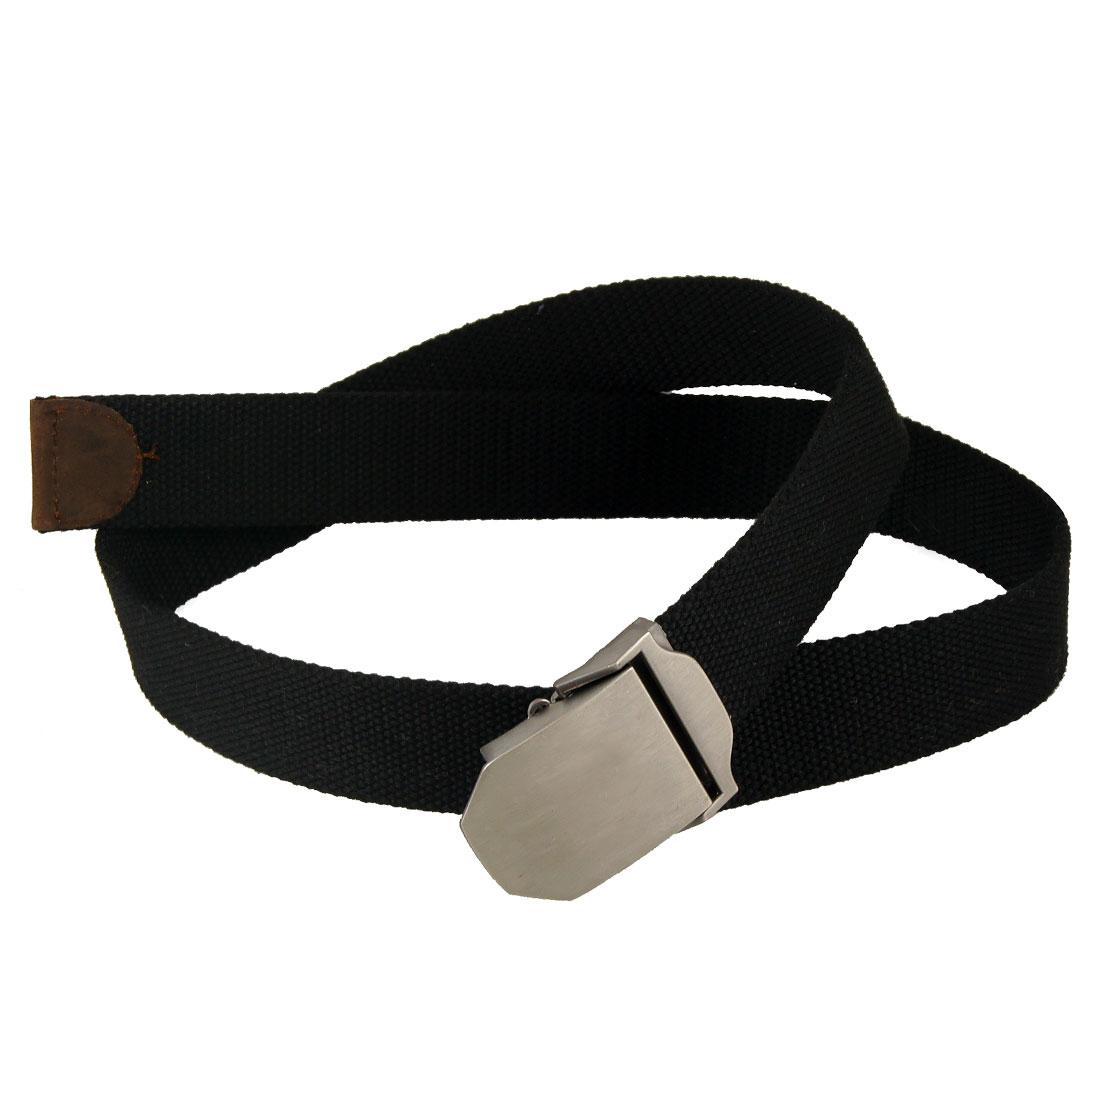 Man Metal Clip Buckle Black Military Canvas Jeans Belt